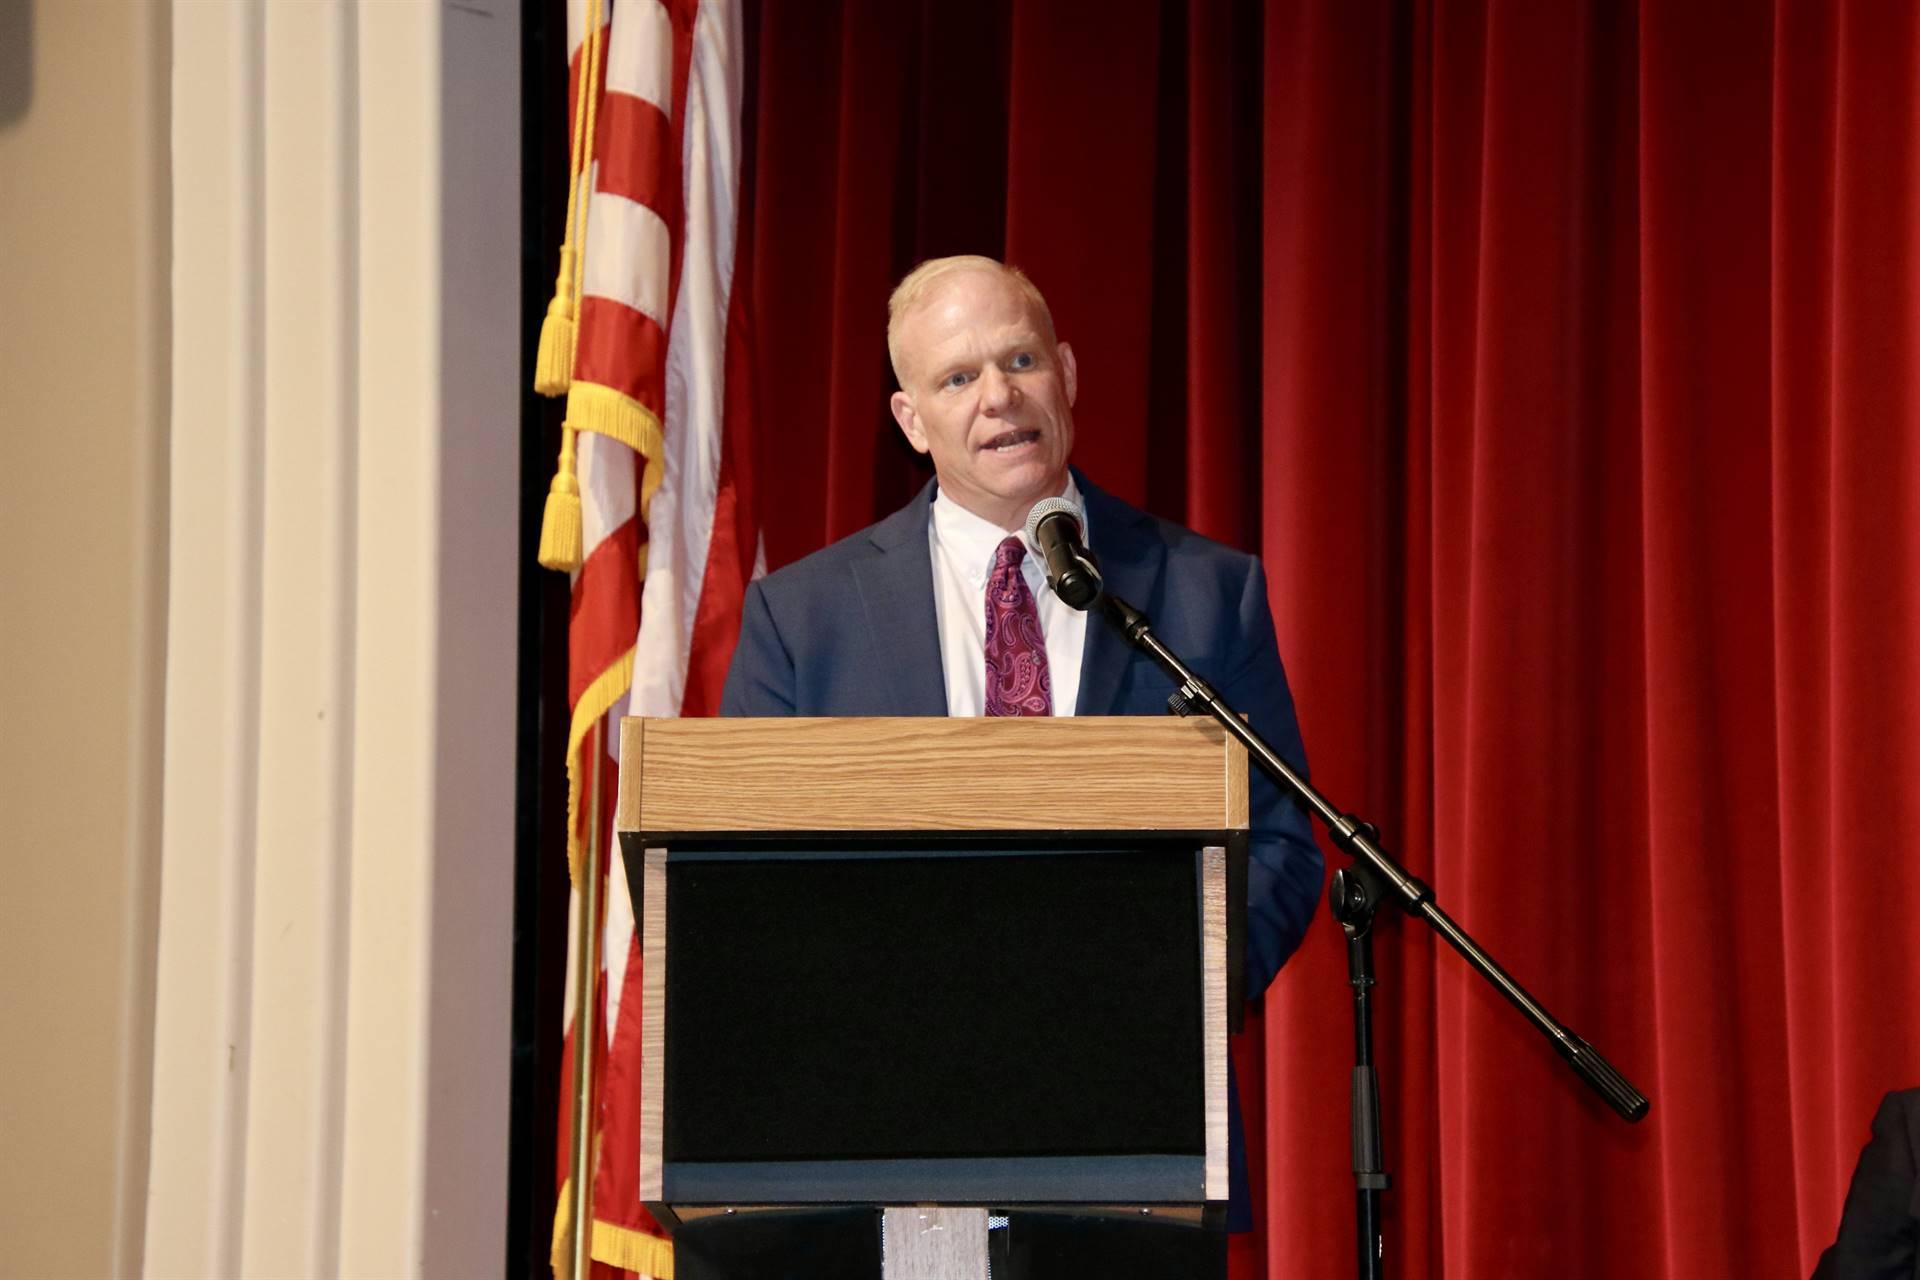 Hall of Distinction - Superintendent Hillis Presenting